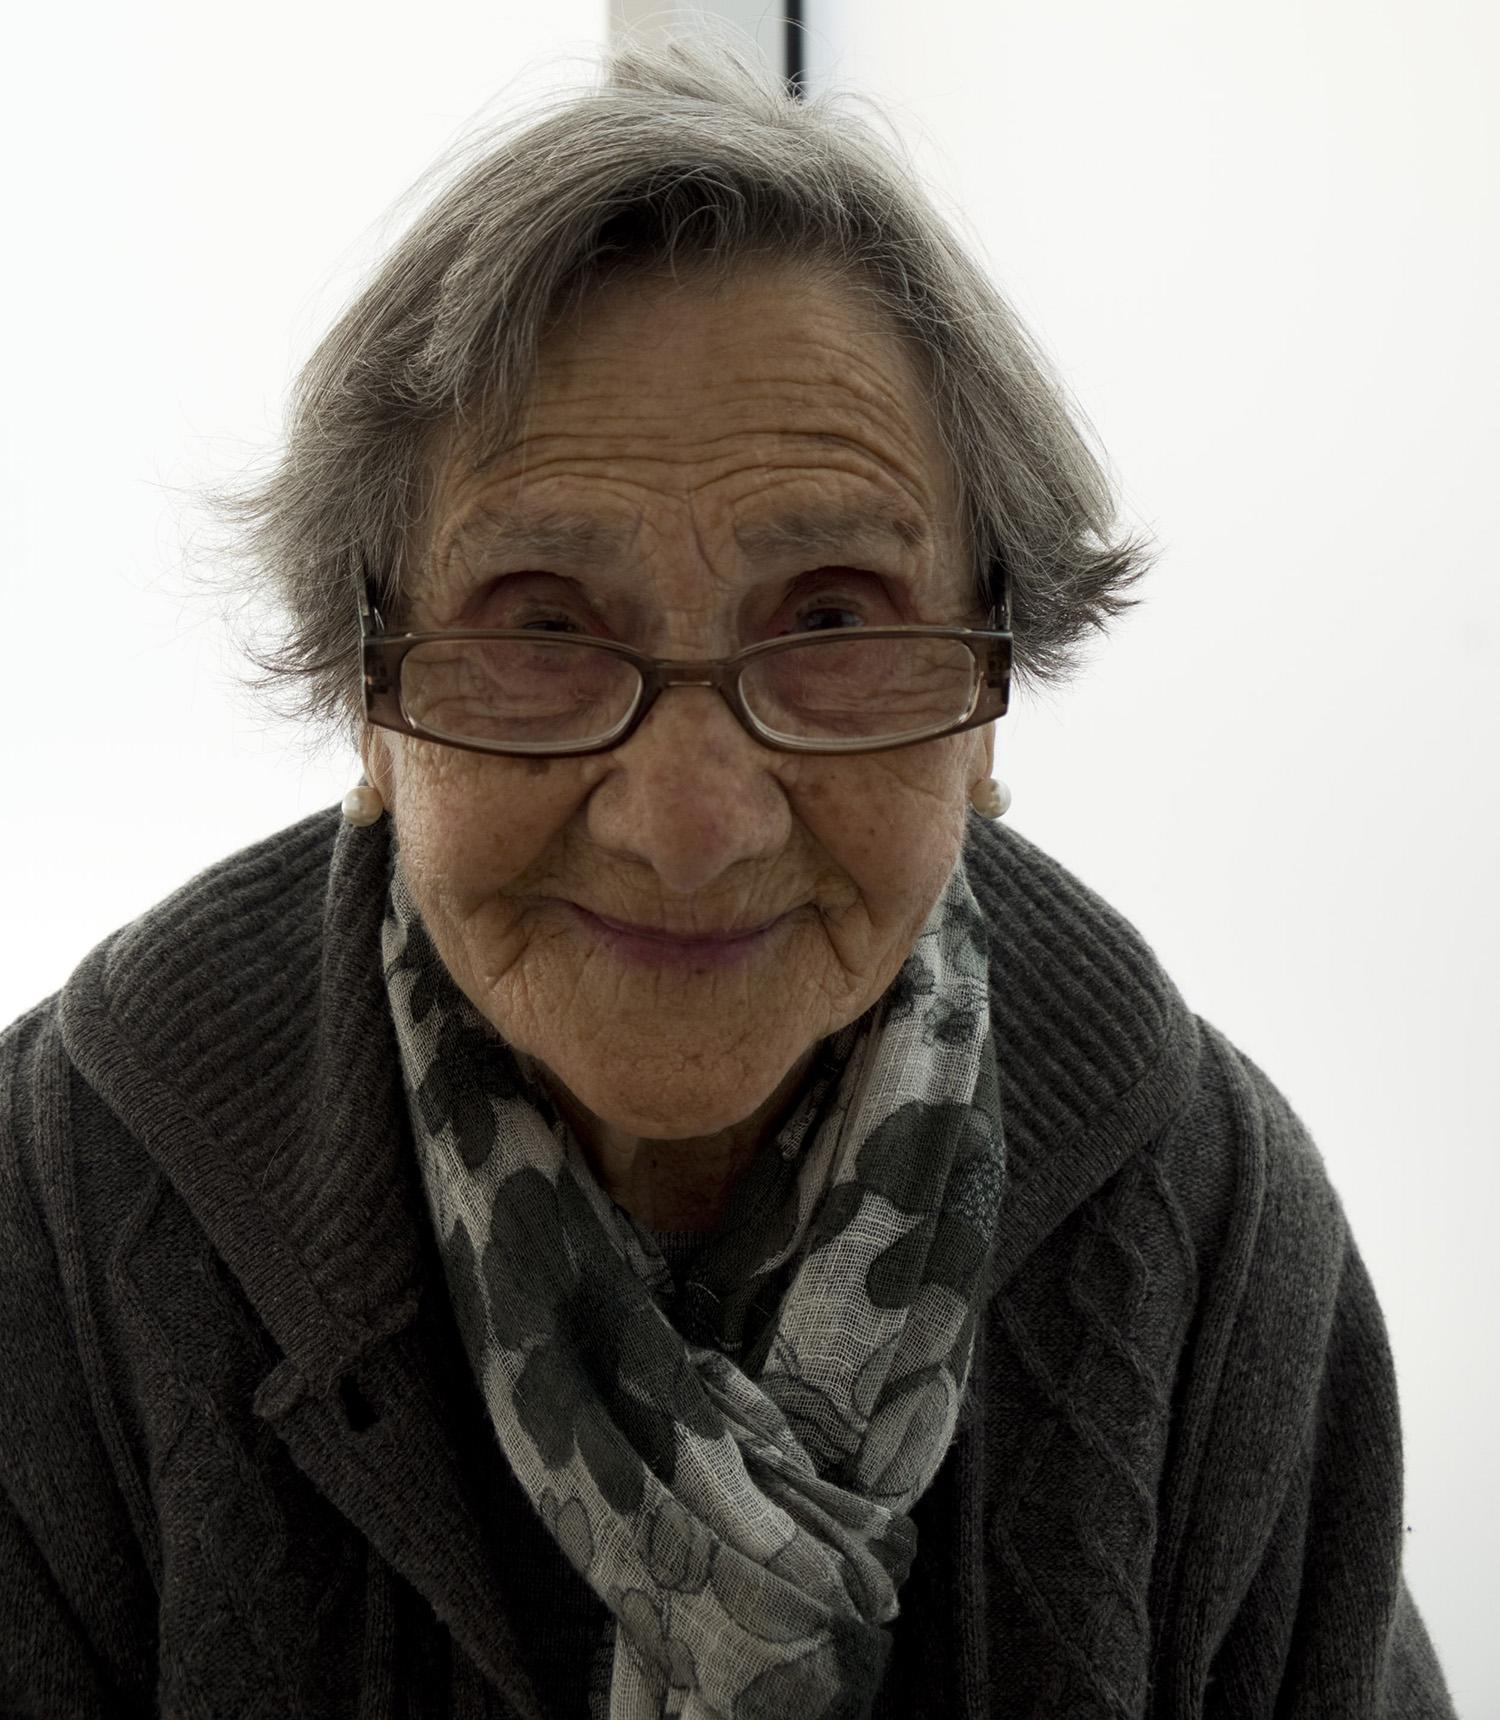 A senhora Natilde no Museu de Rendas de Bilros de Peniche